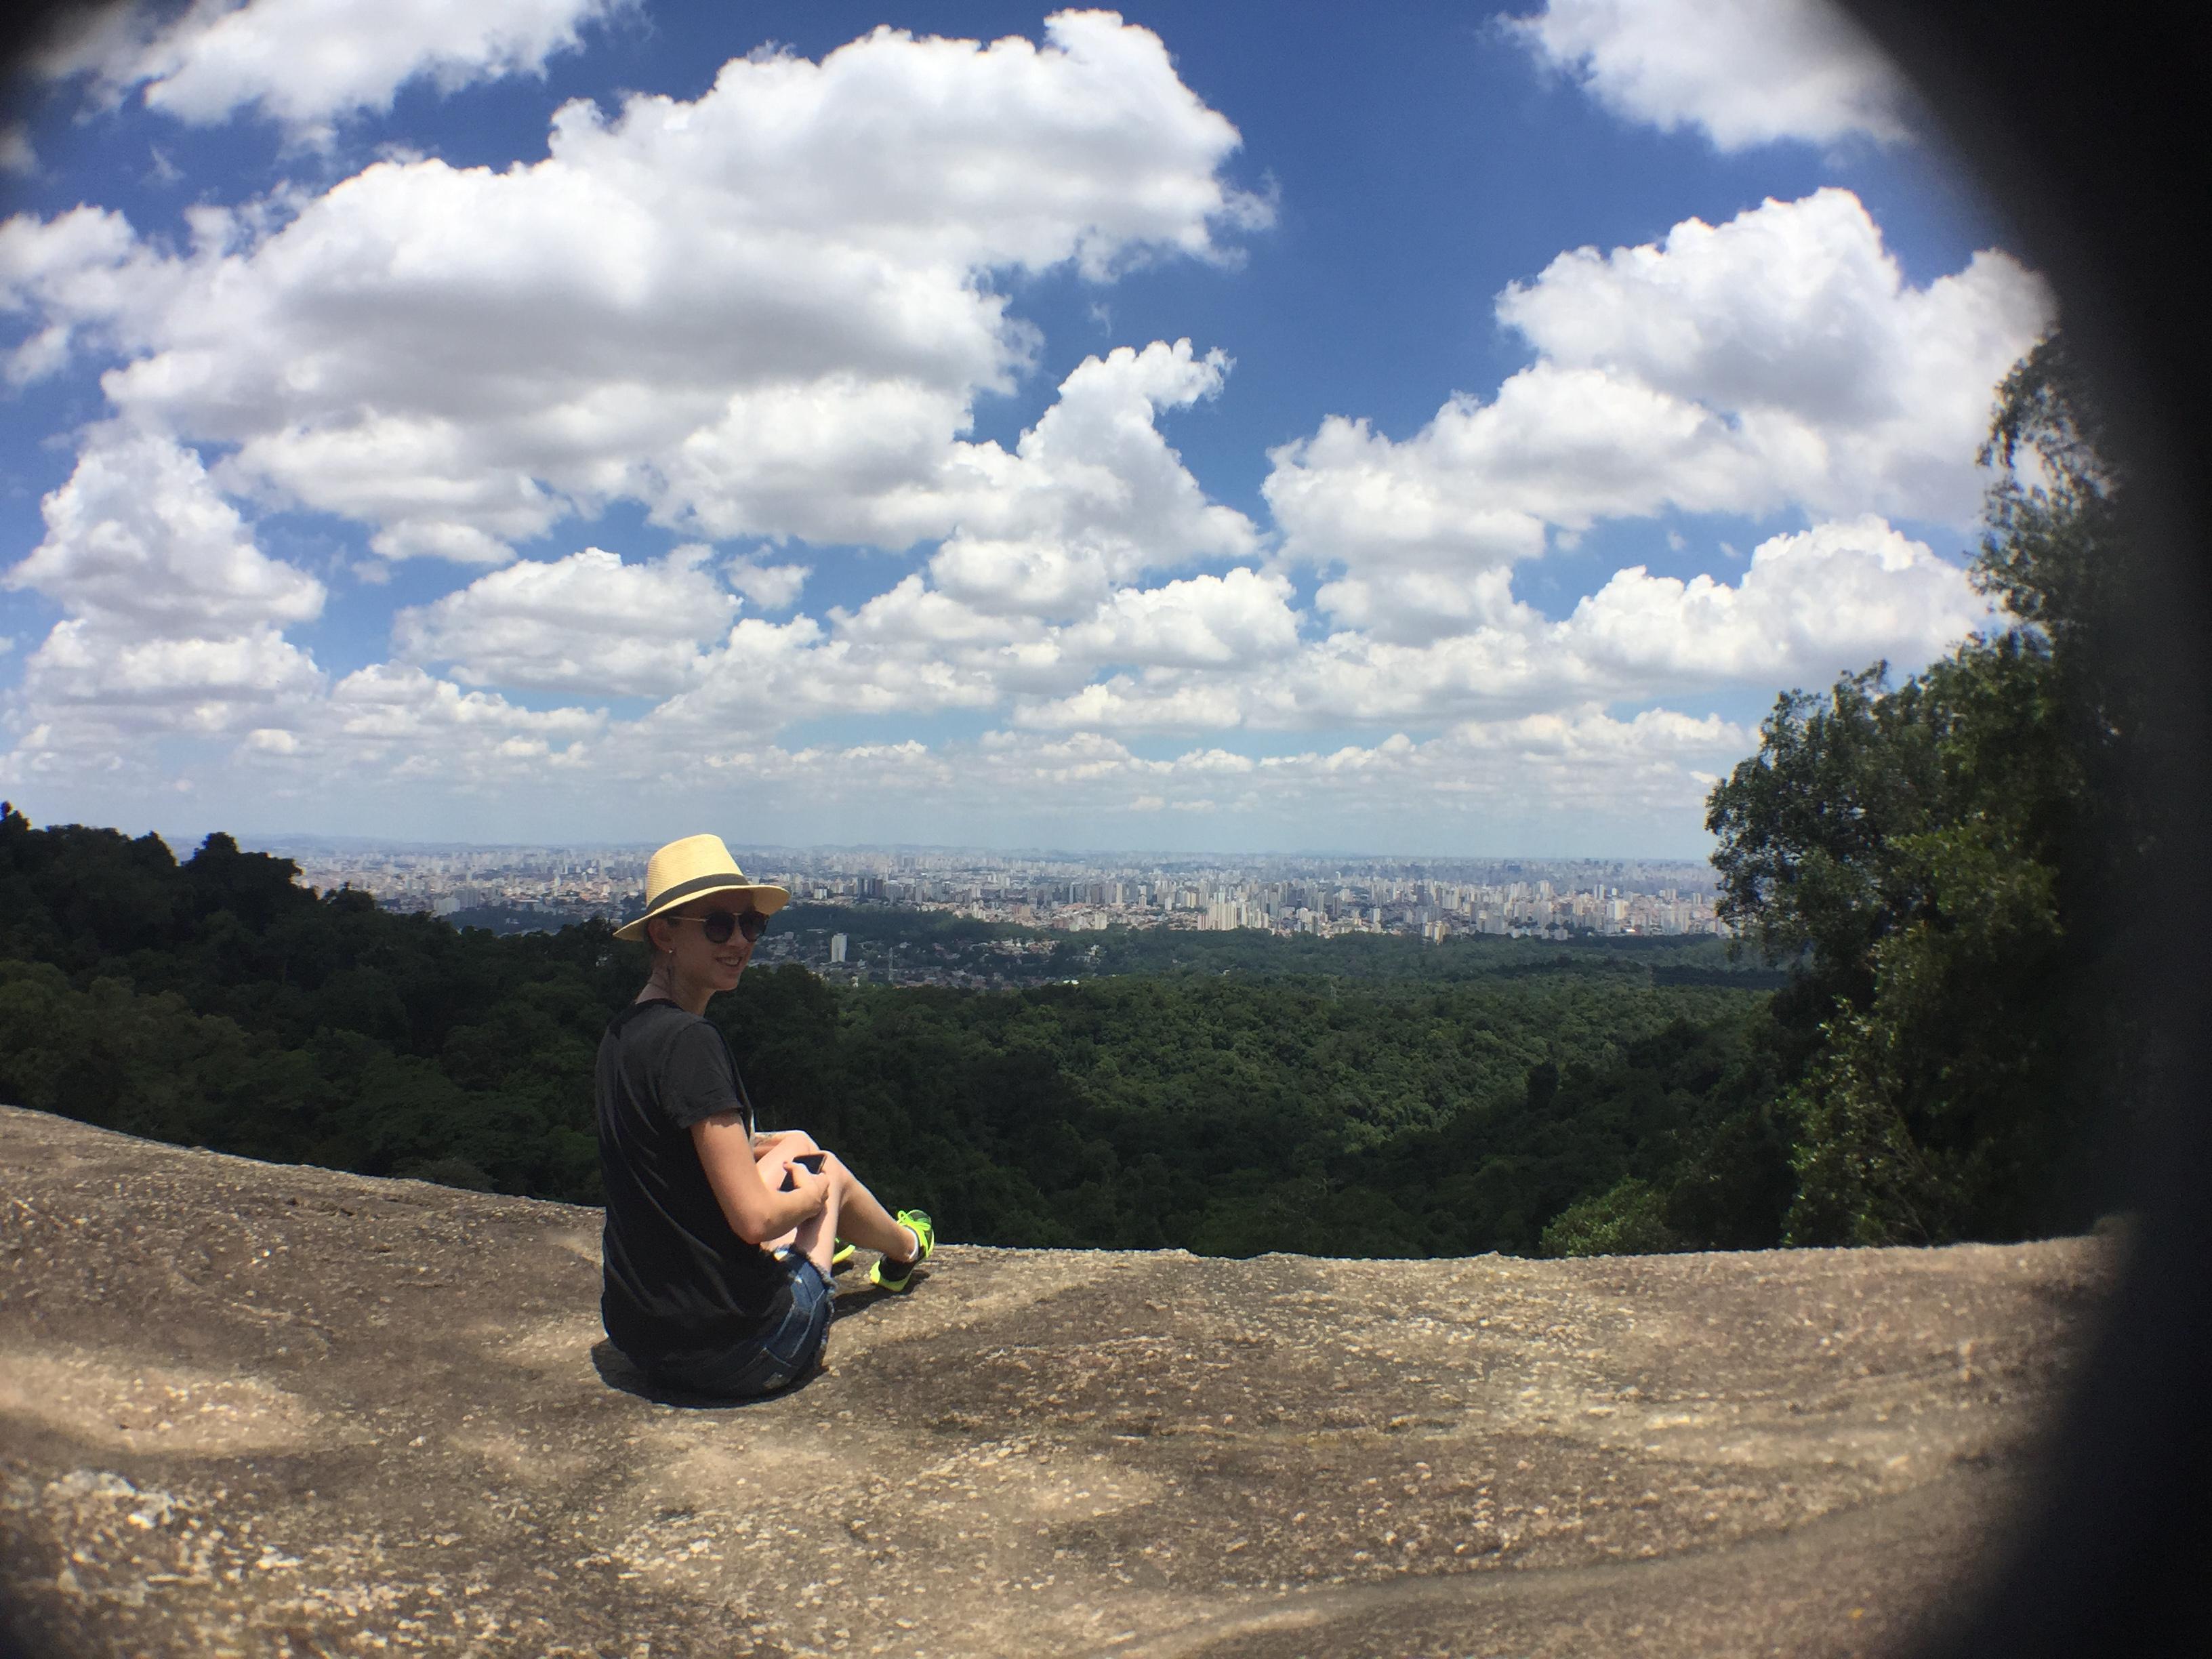 Vista da trilha da pedra grande na cantareira